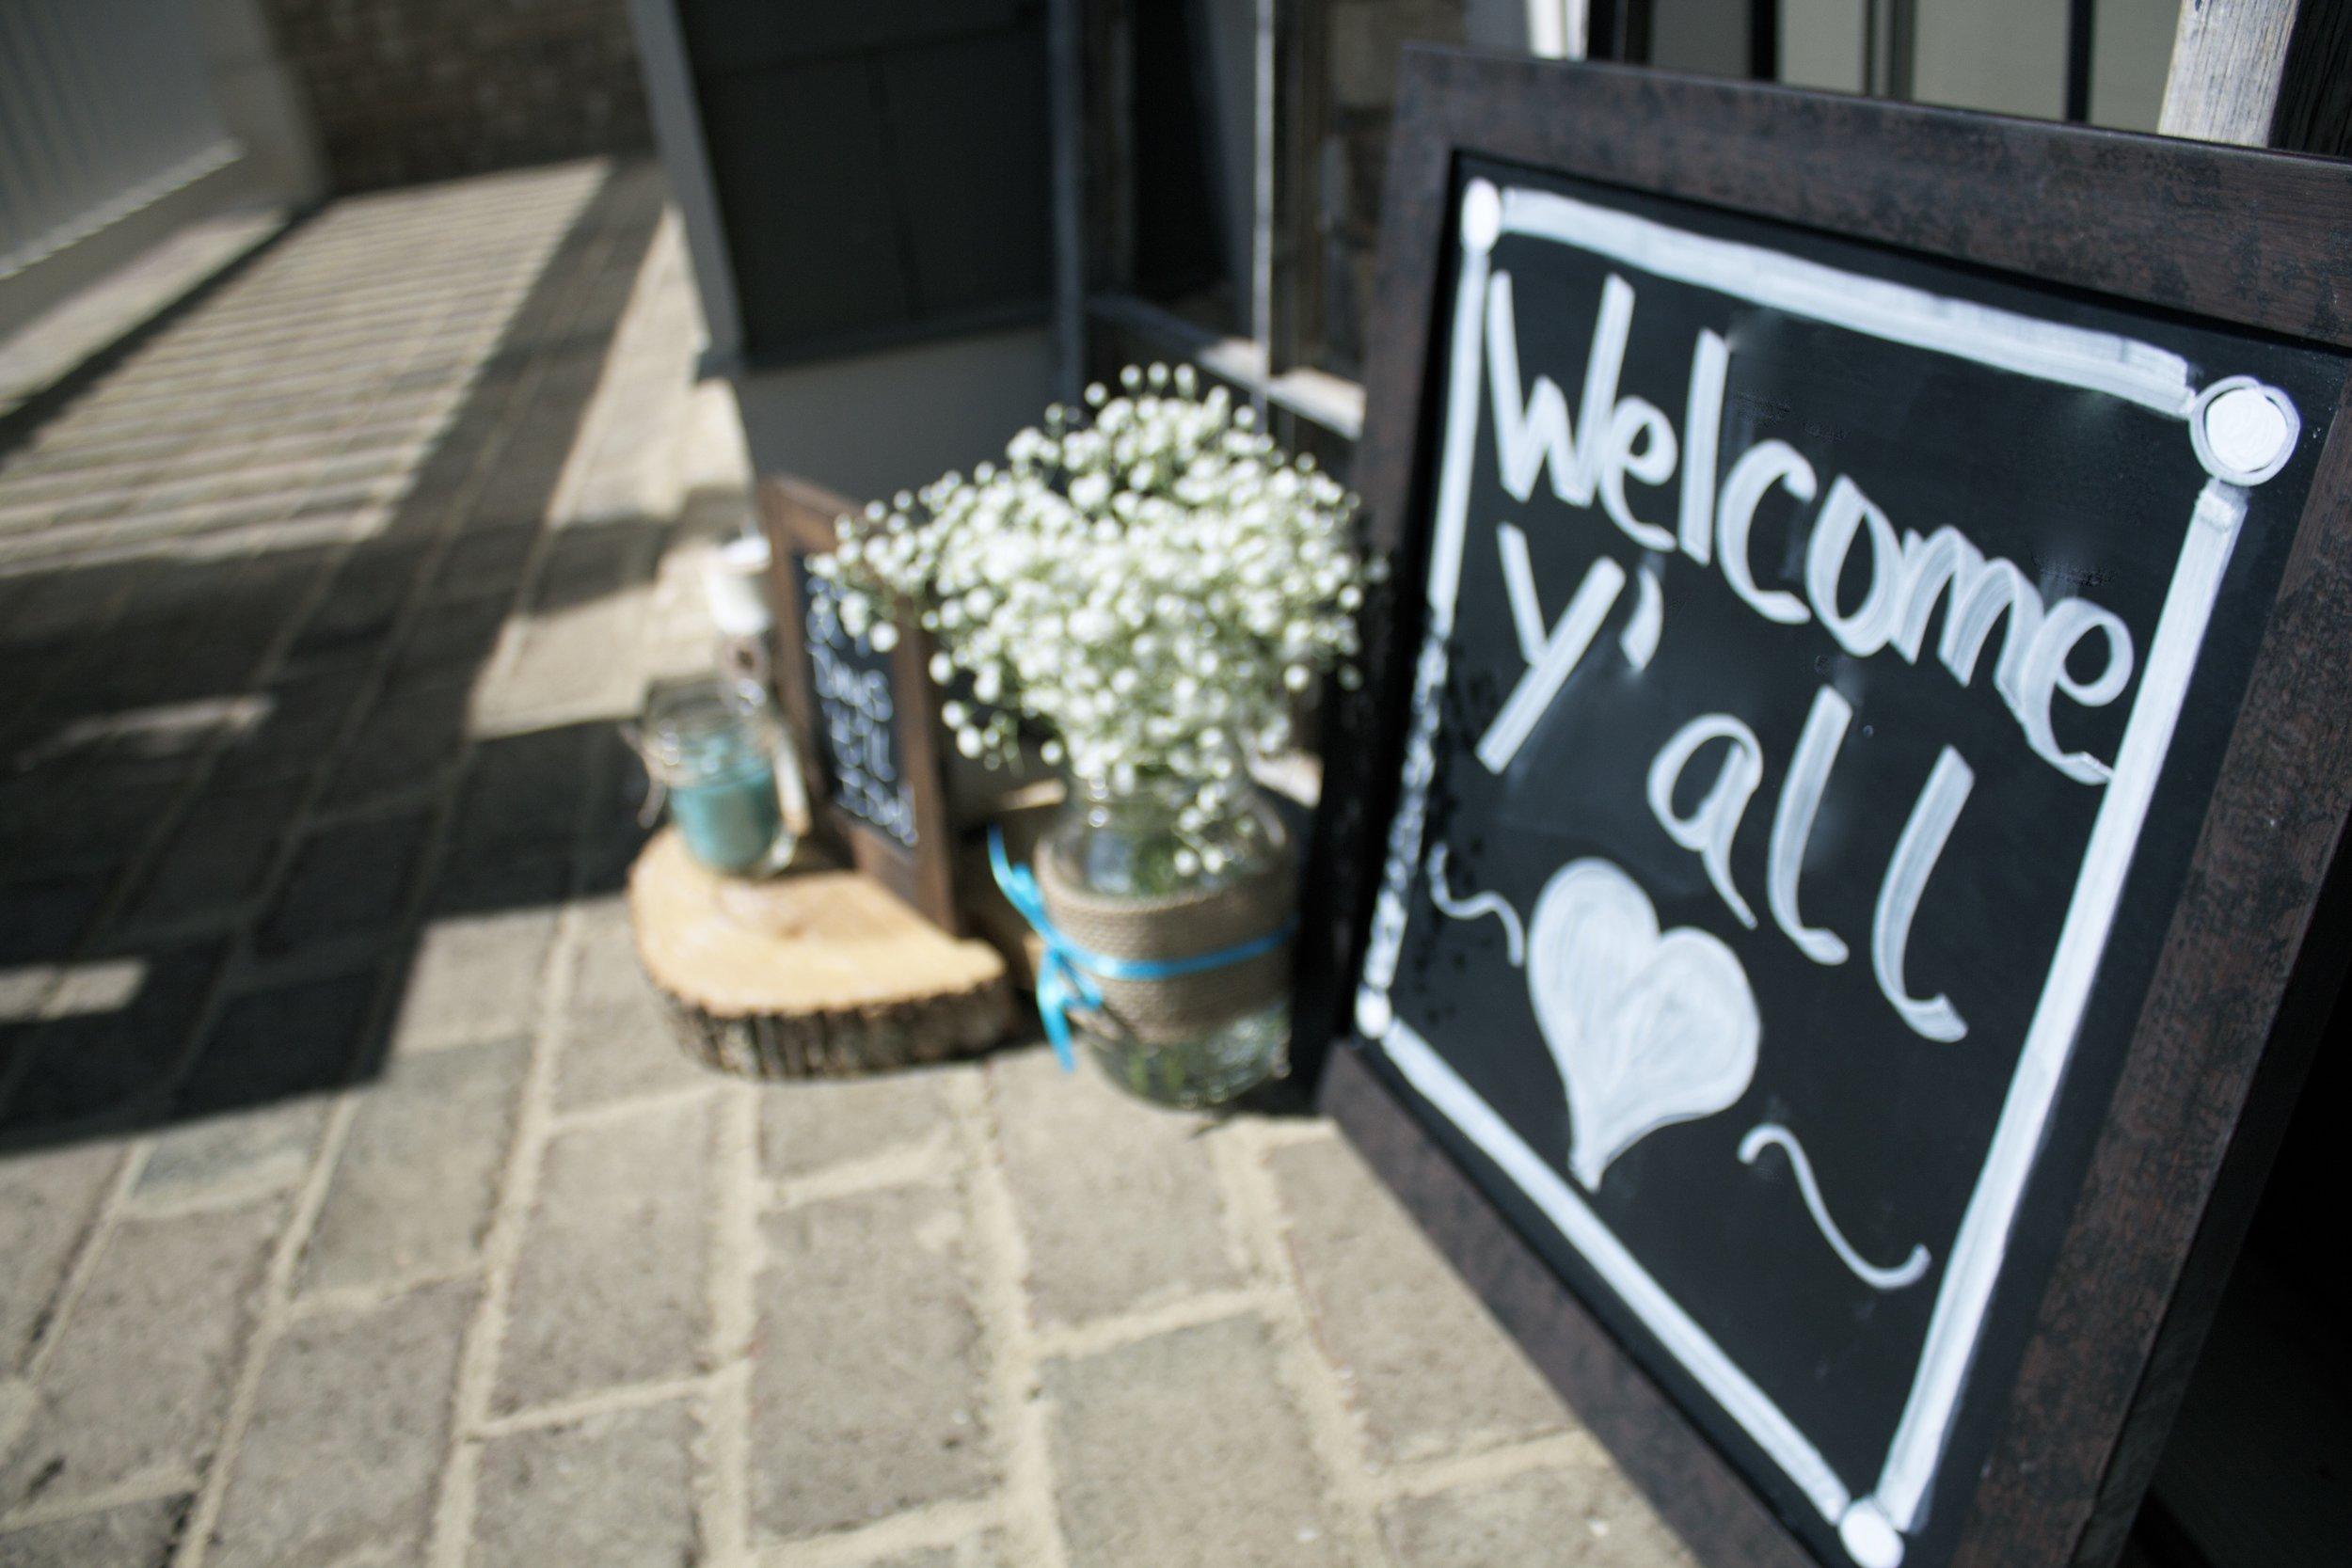 bridal-shower-welcome-chalkboard-title